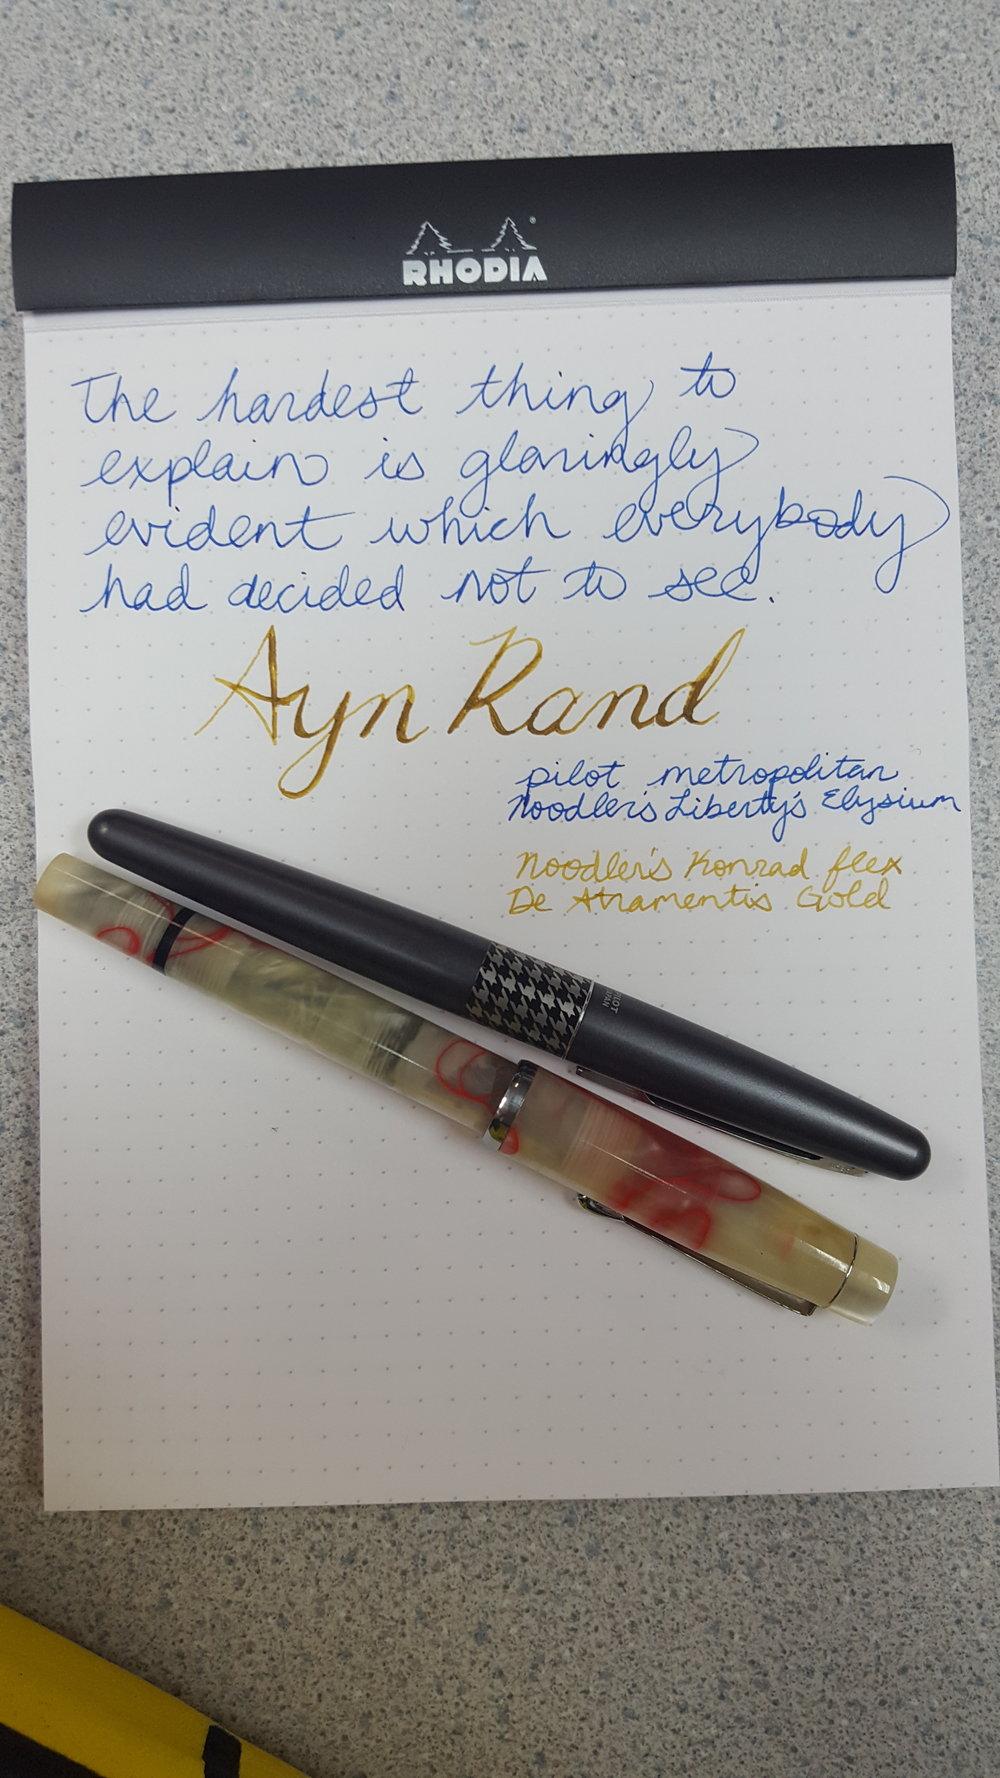 Goulet Pens, Ayn Rand